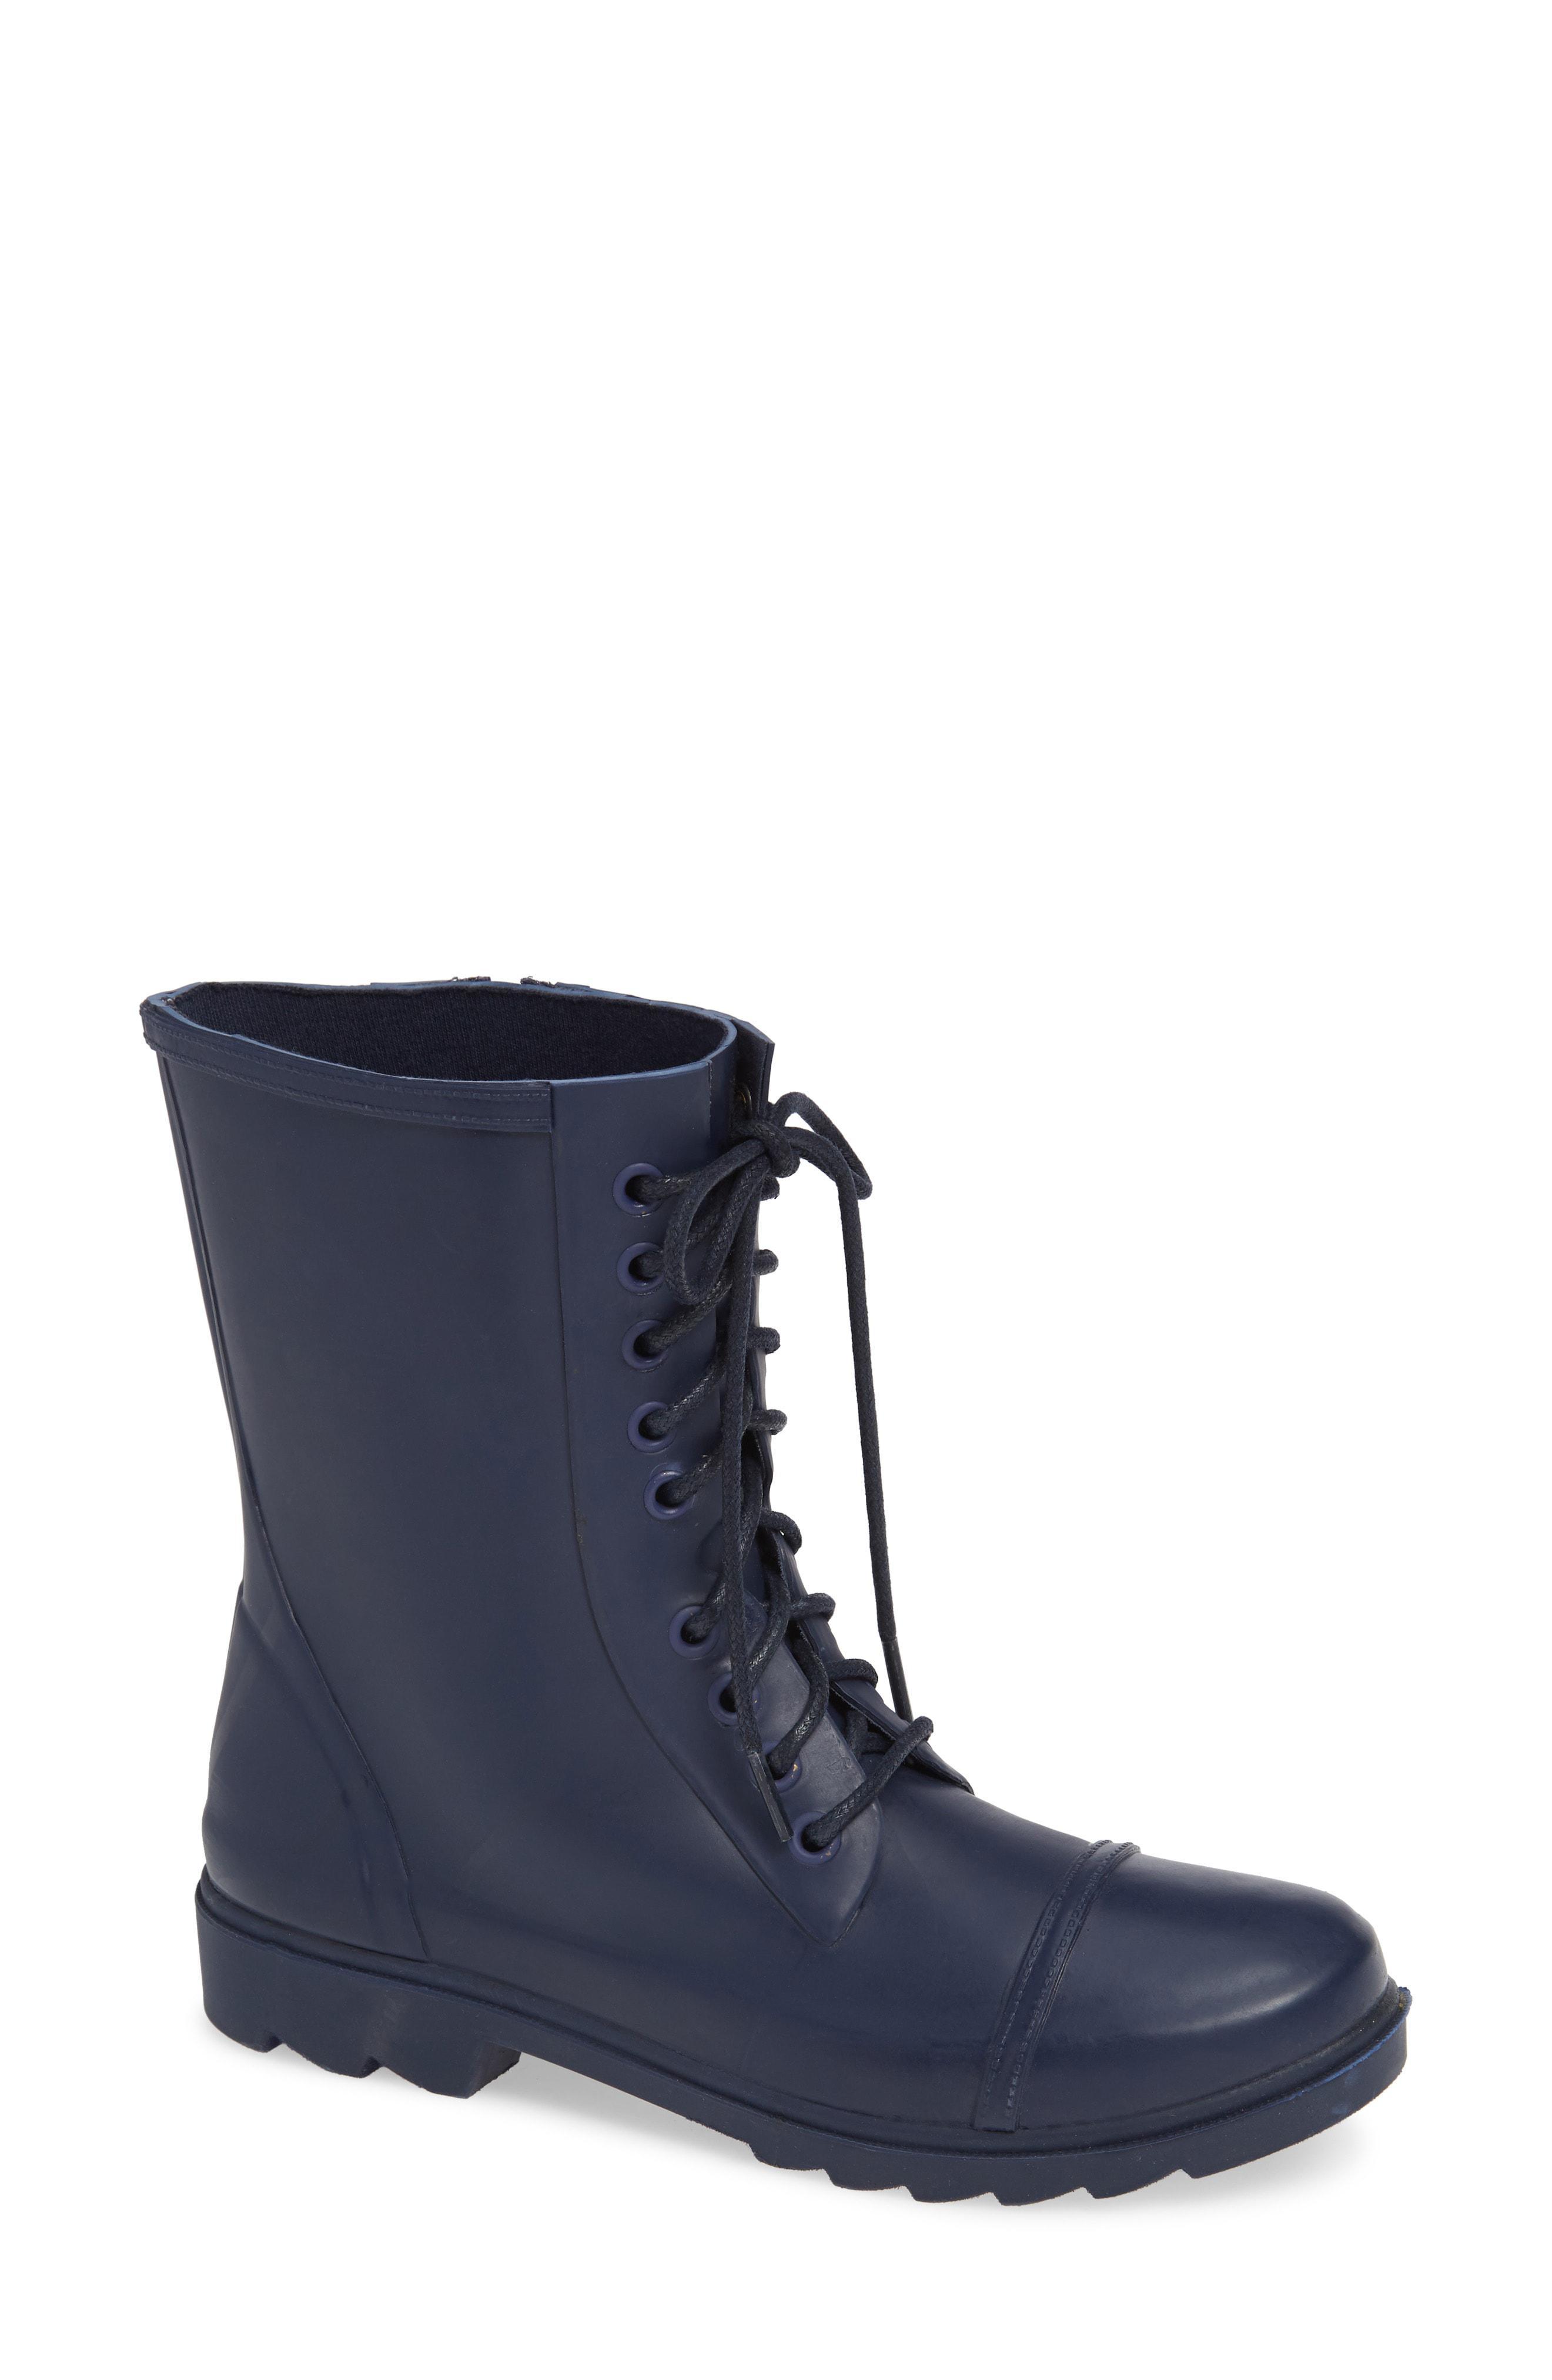 b6da3f79825 Steve Madden Troopa-r (blue) Shoes